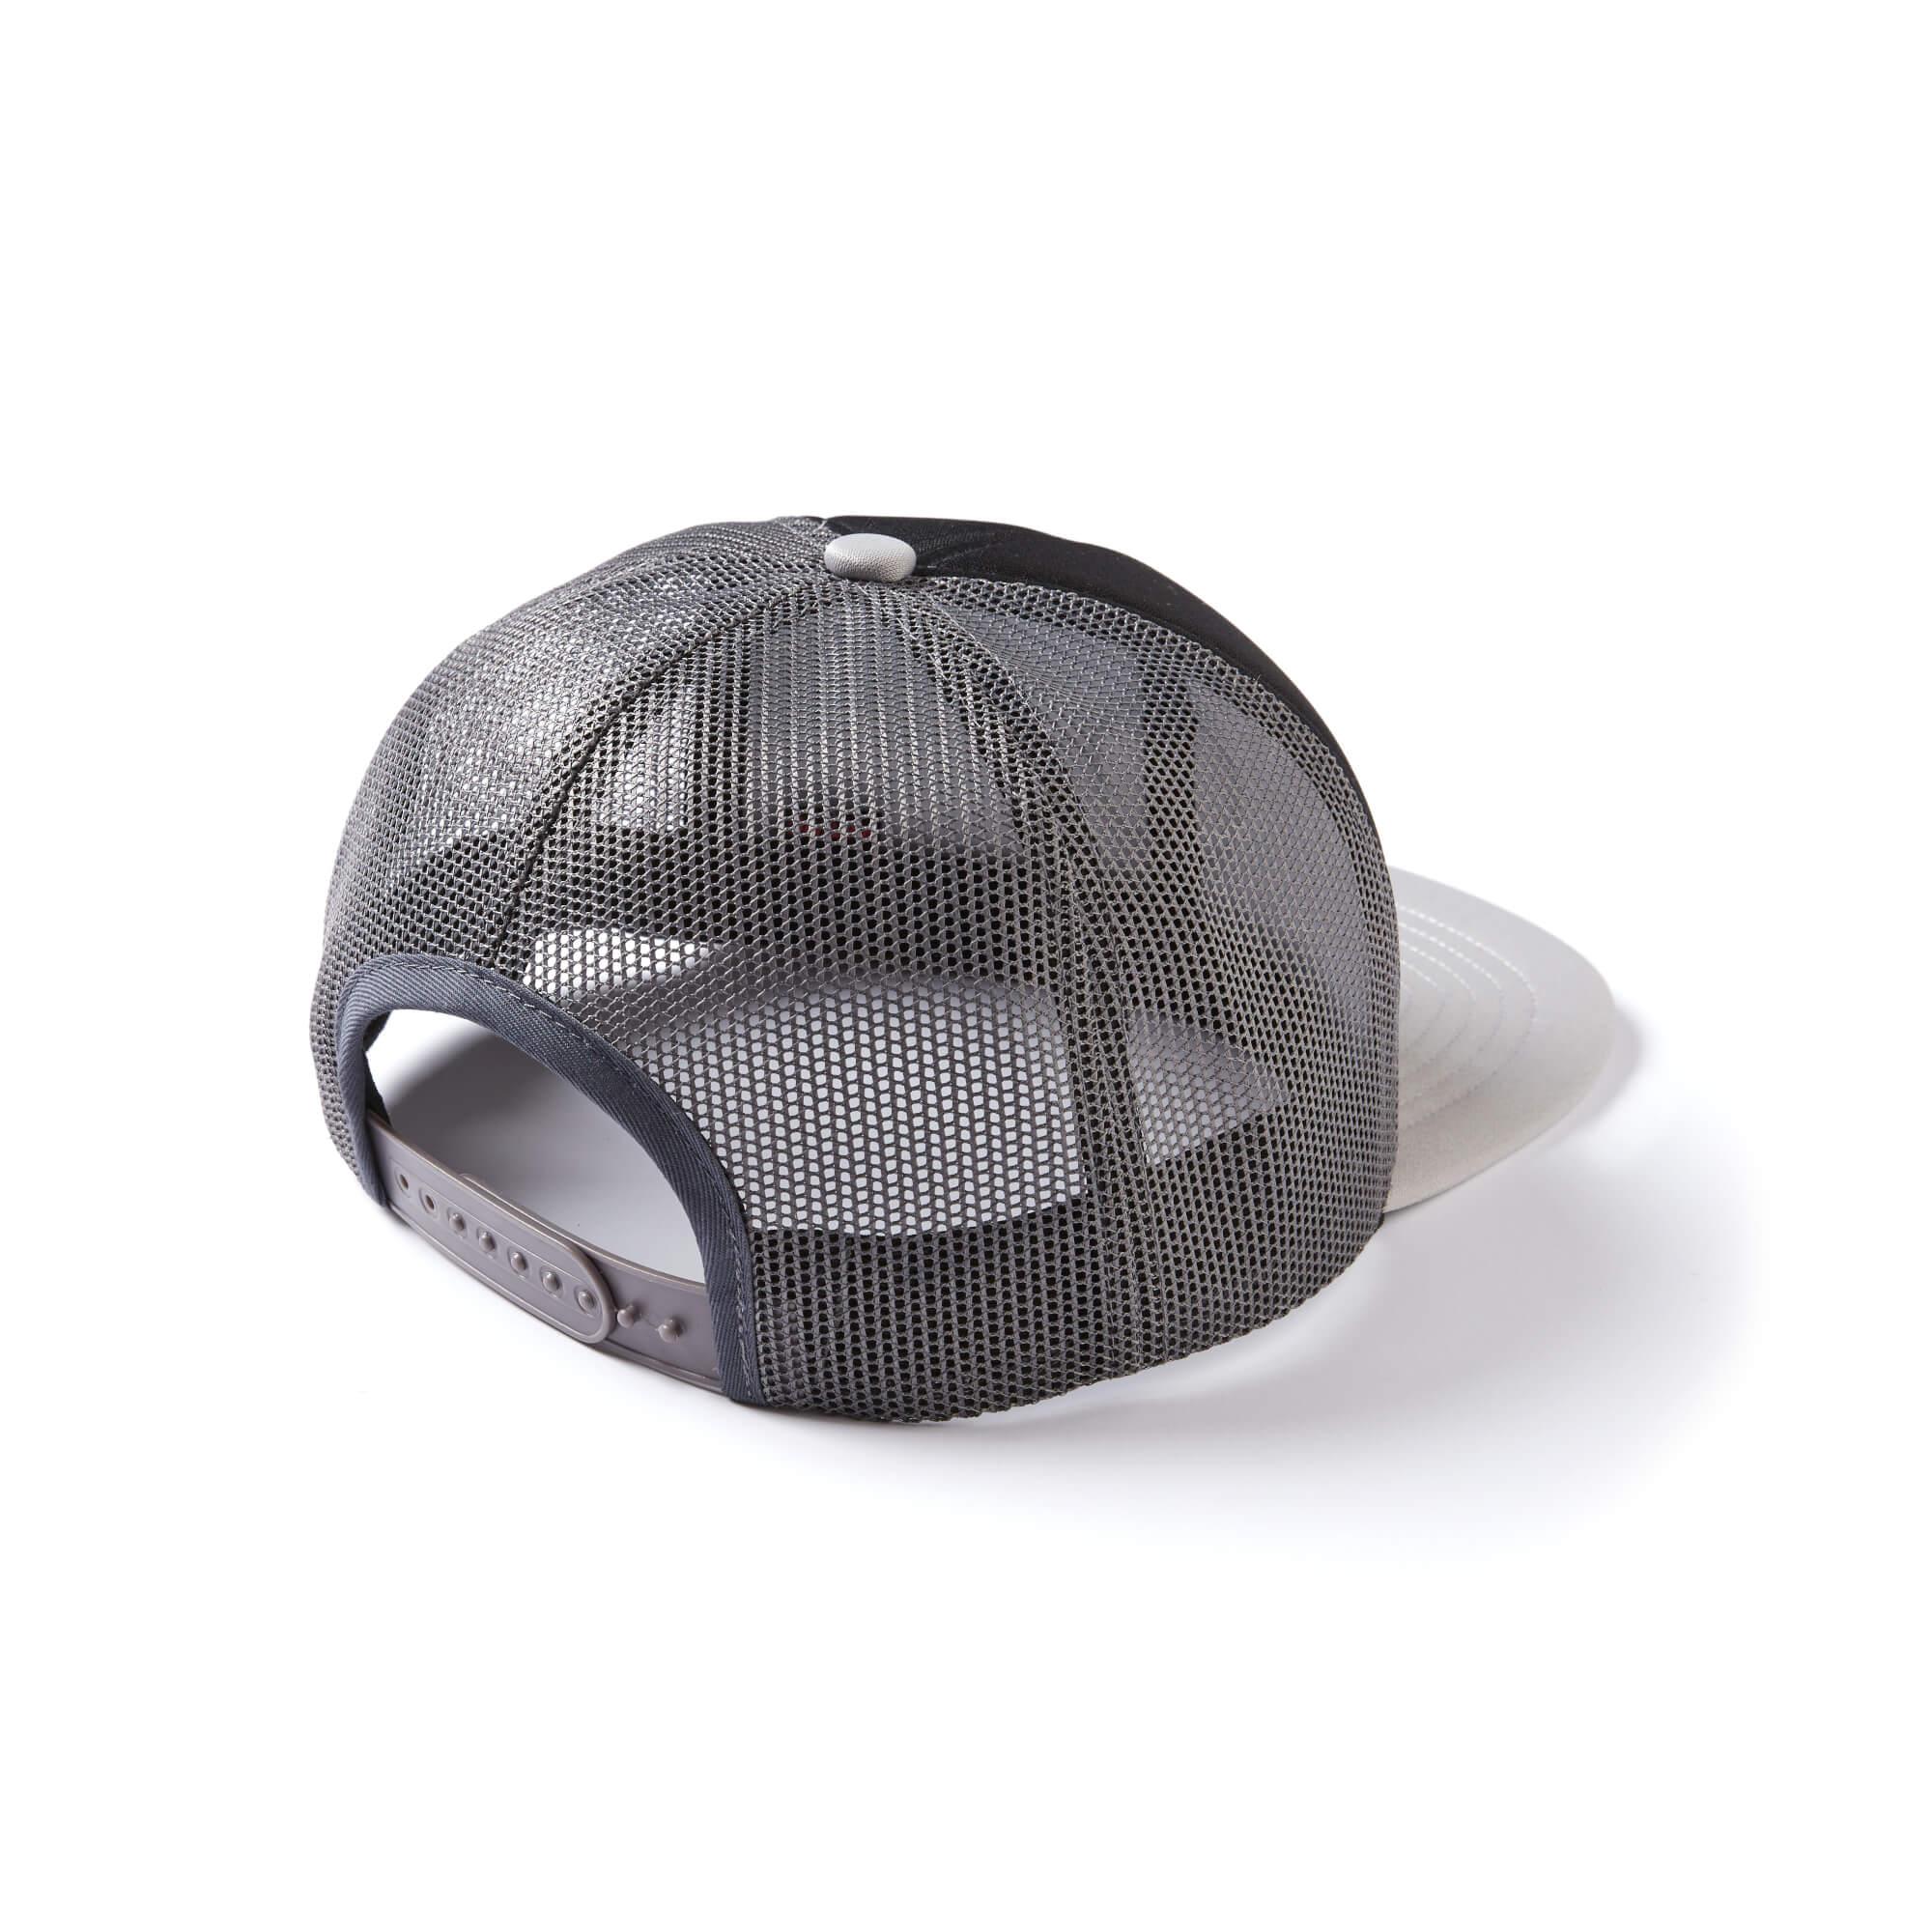 Volcom-V-Quarter-Cheese-Trucker-Hat Indexbild 4